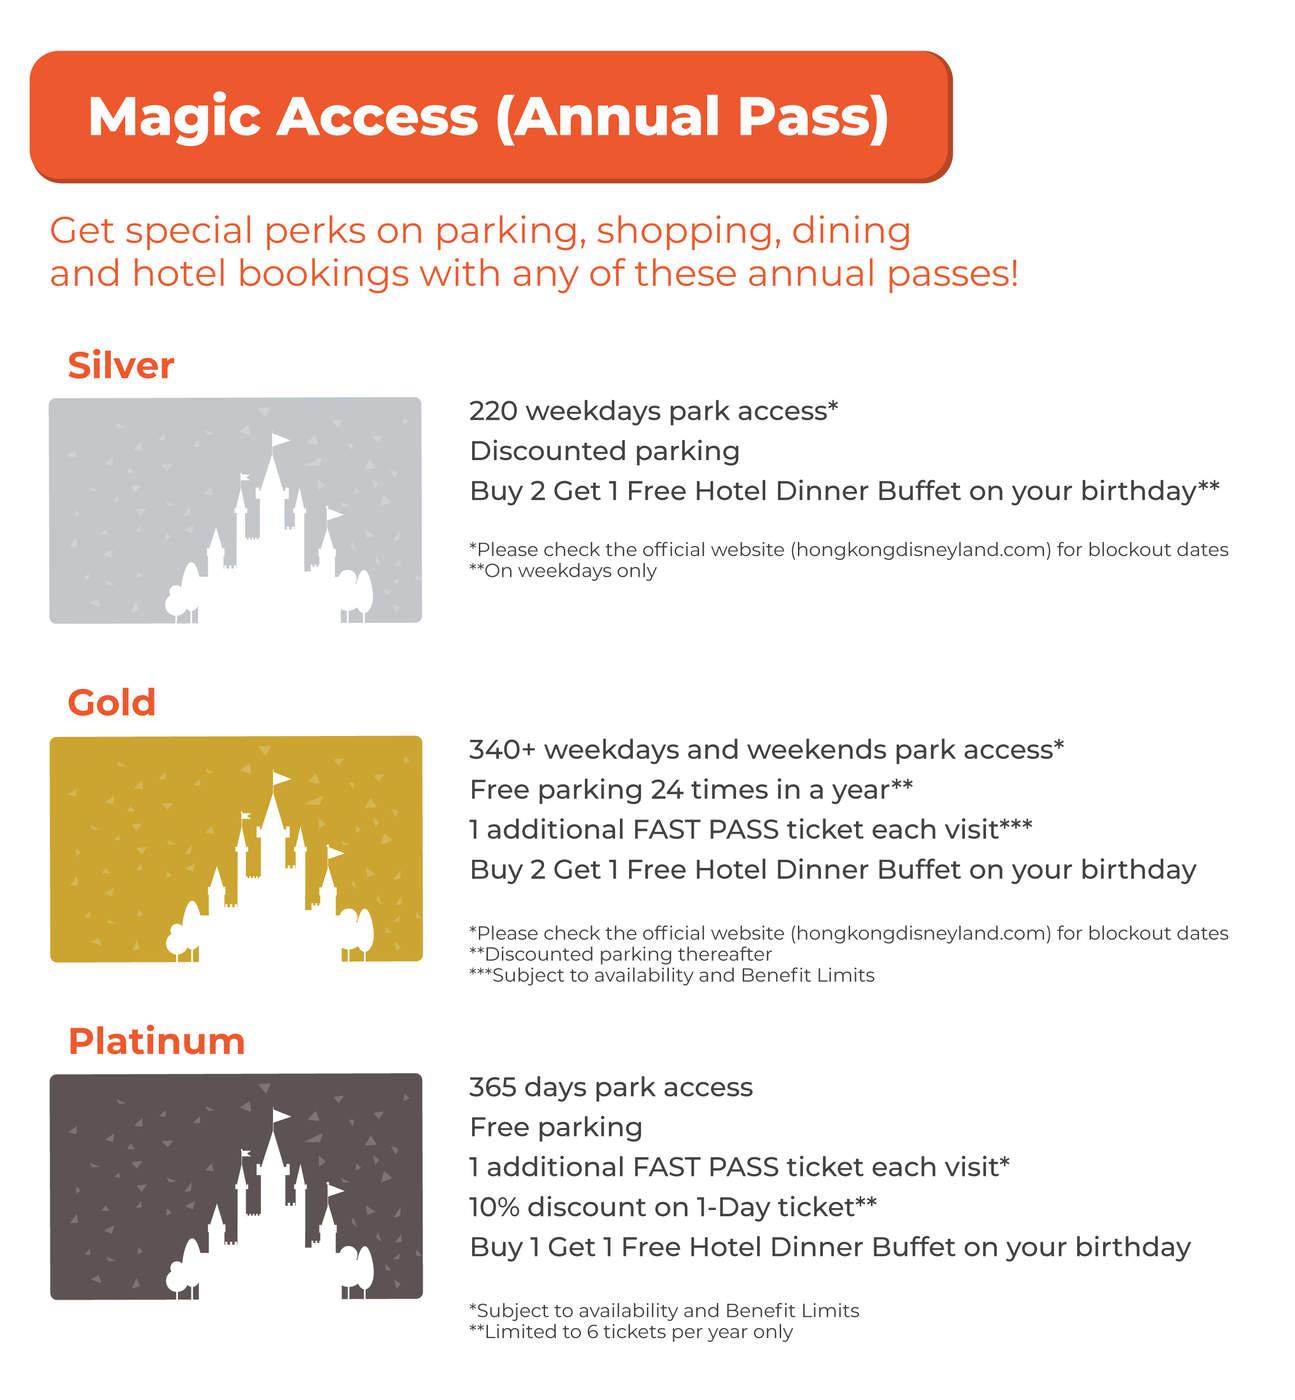 Enjoy one year of Magic Access!